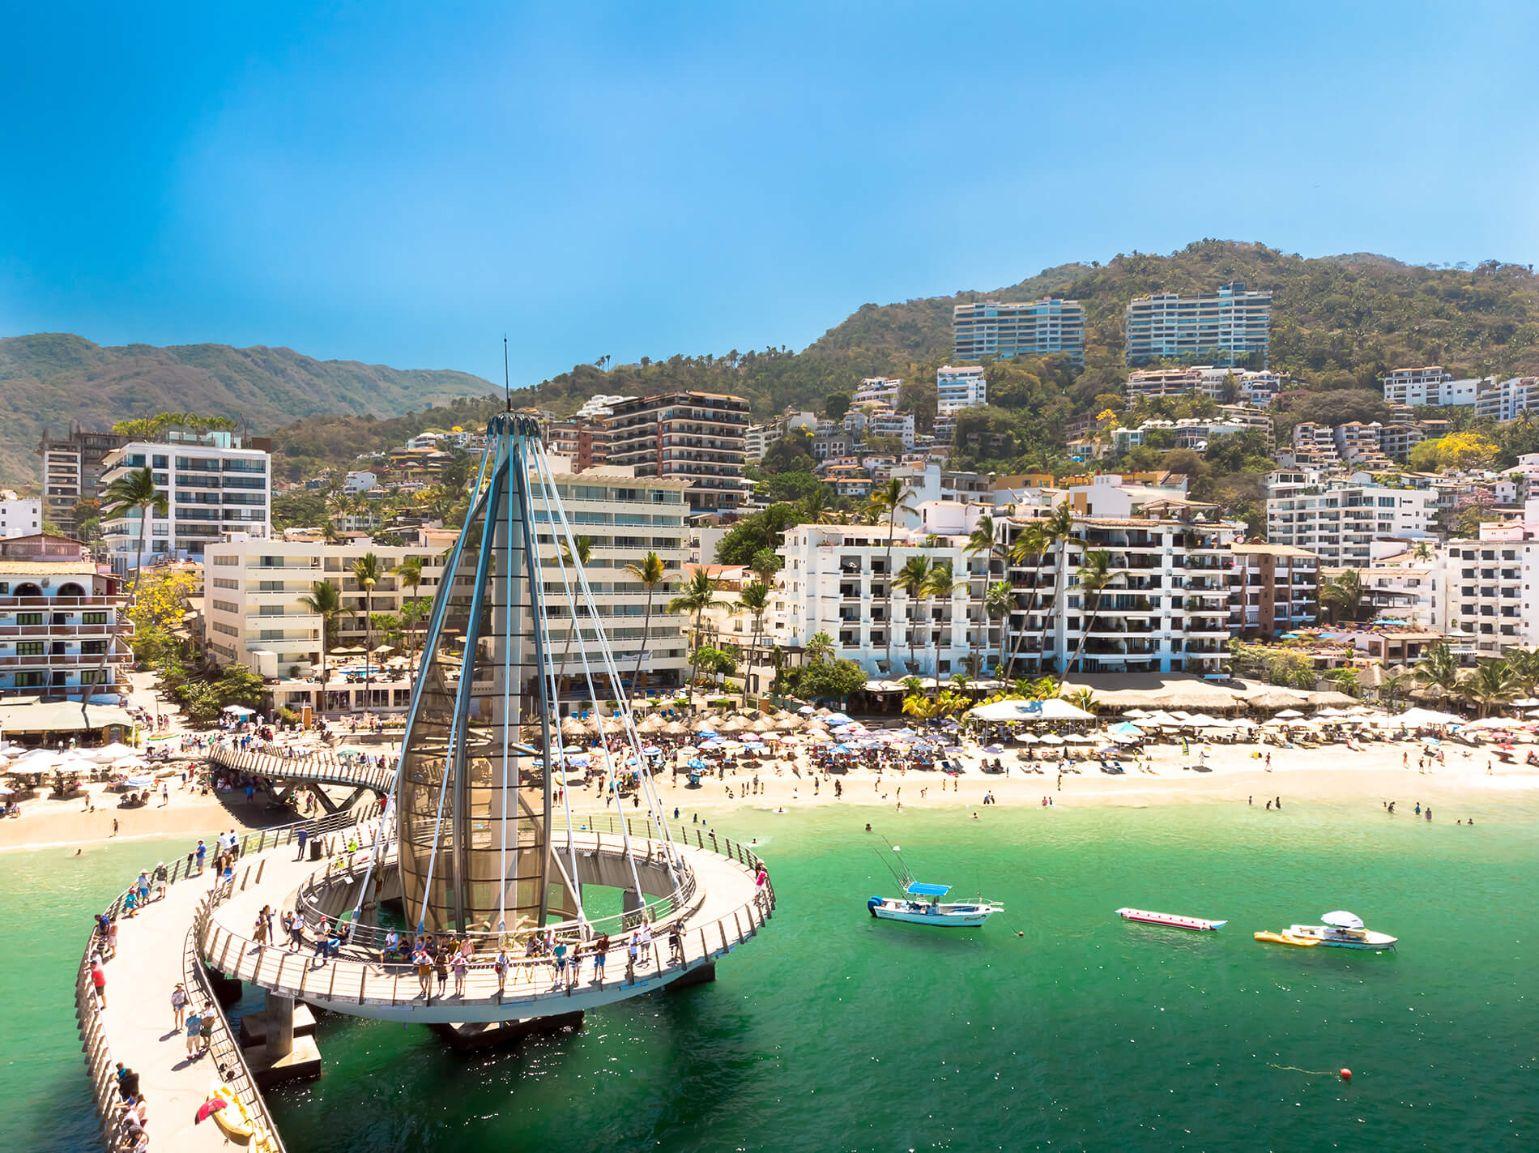 Casa Hill Properties Puerto Vallarta Mexico Vacation Rentals Real Estate Property Management.